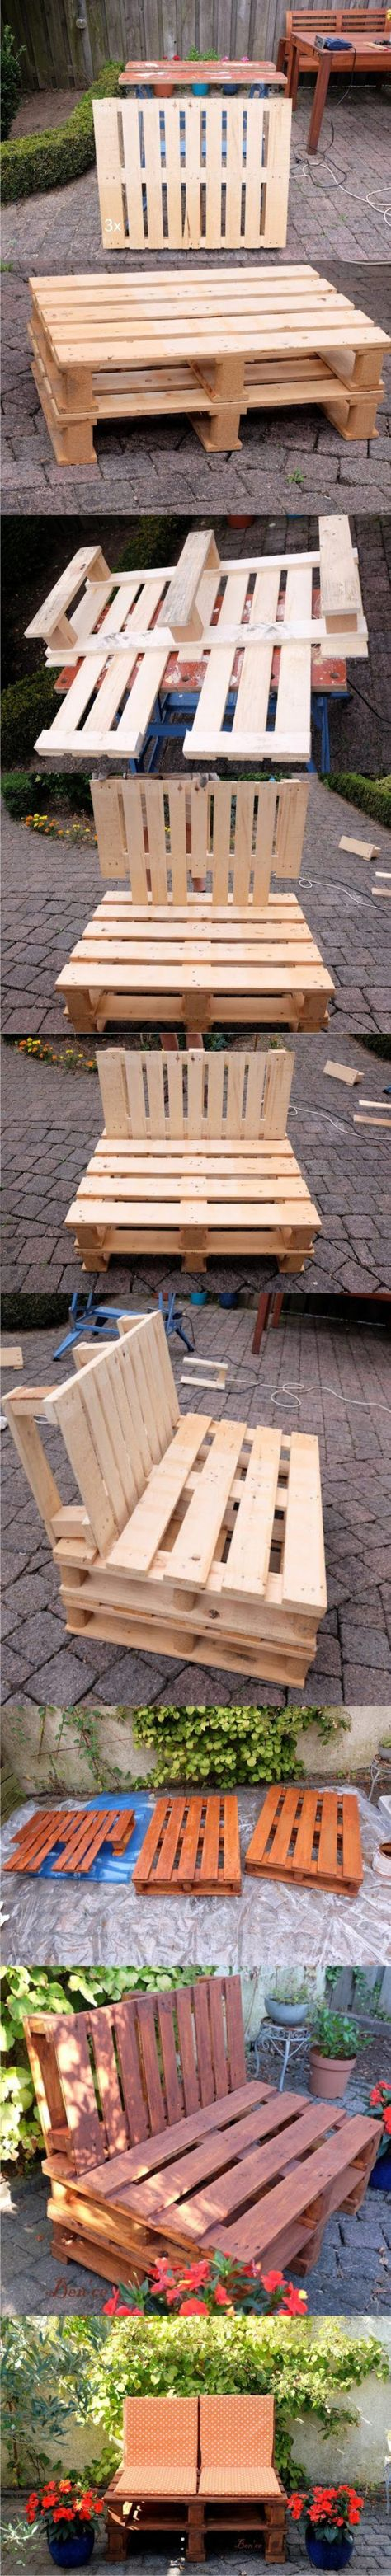 Pin By Han Nah On Gute Ideen Pallet Diy Pallet Furniture Bench Pallet Furniture